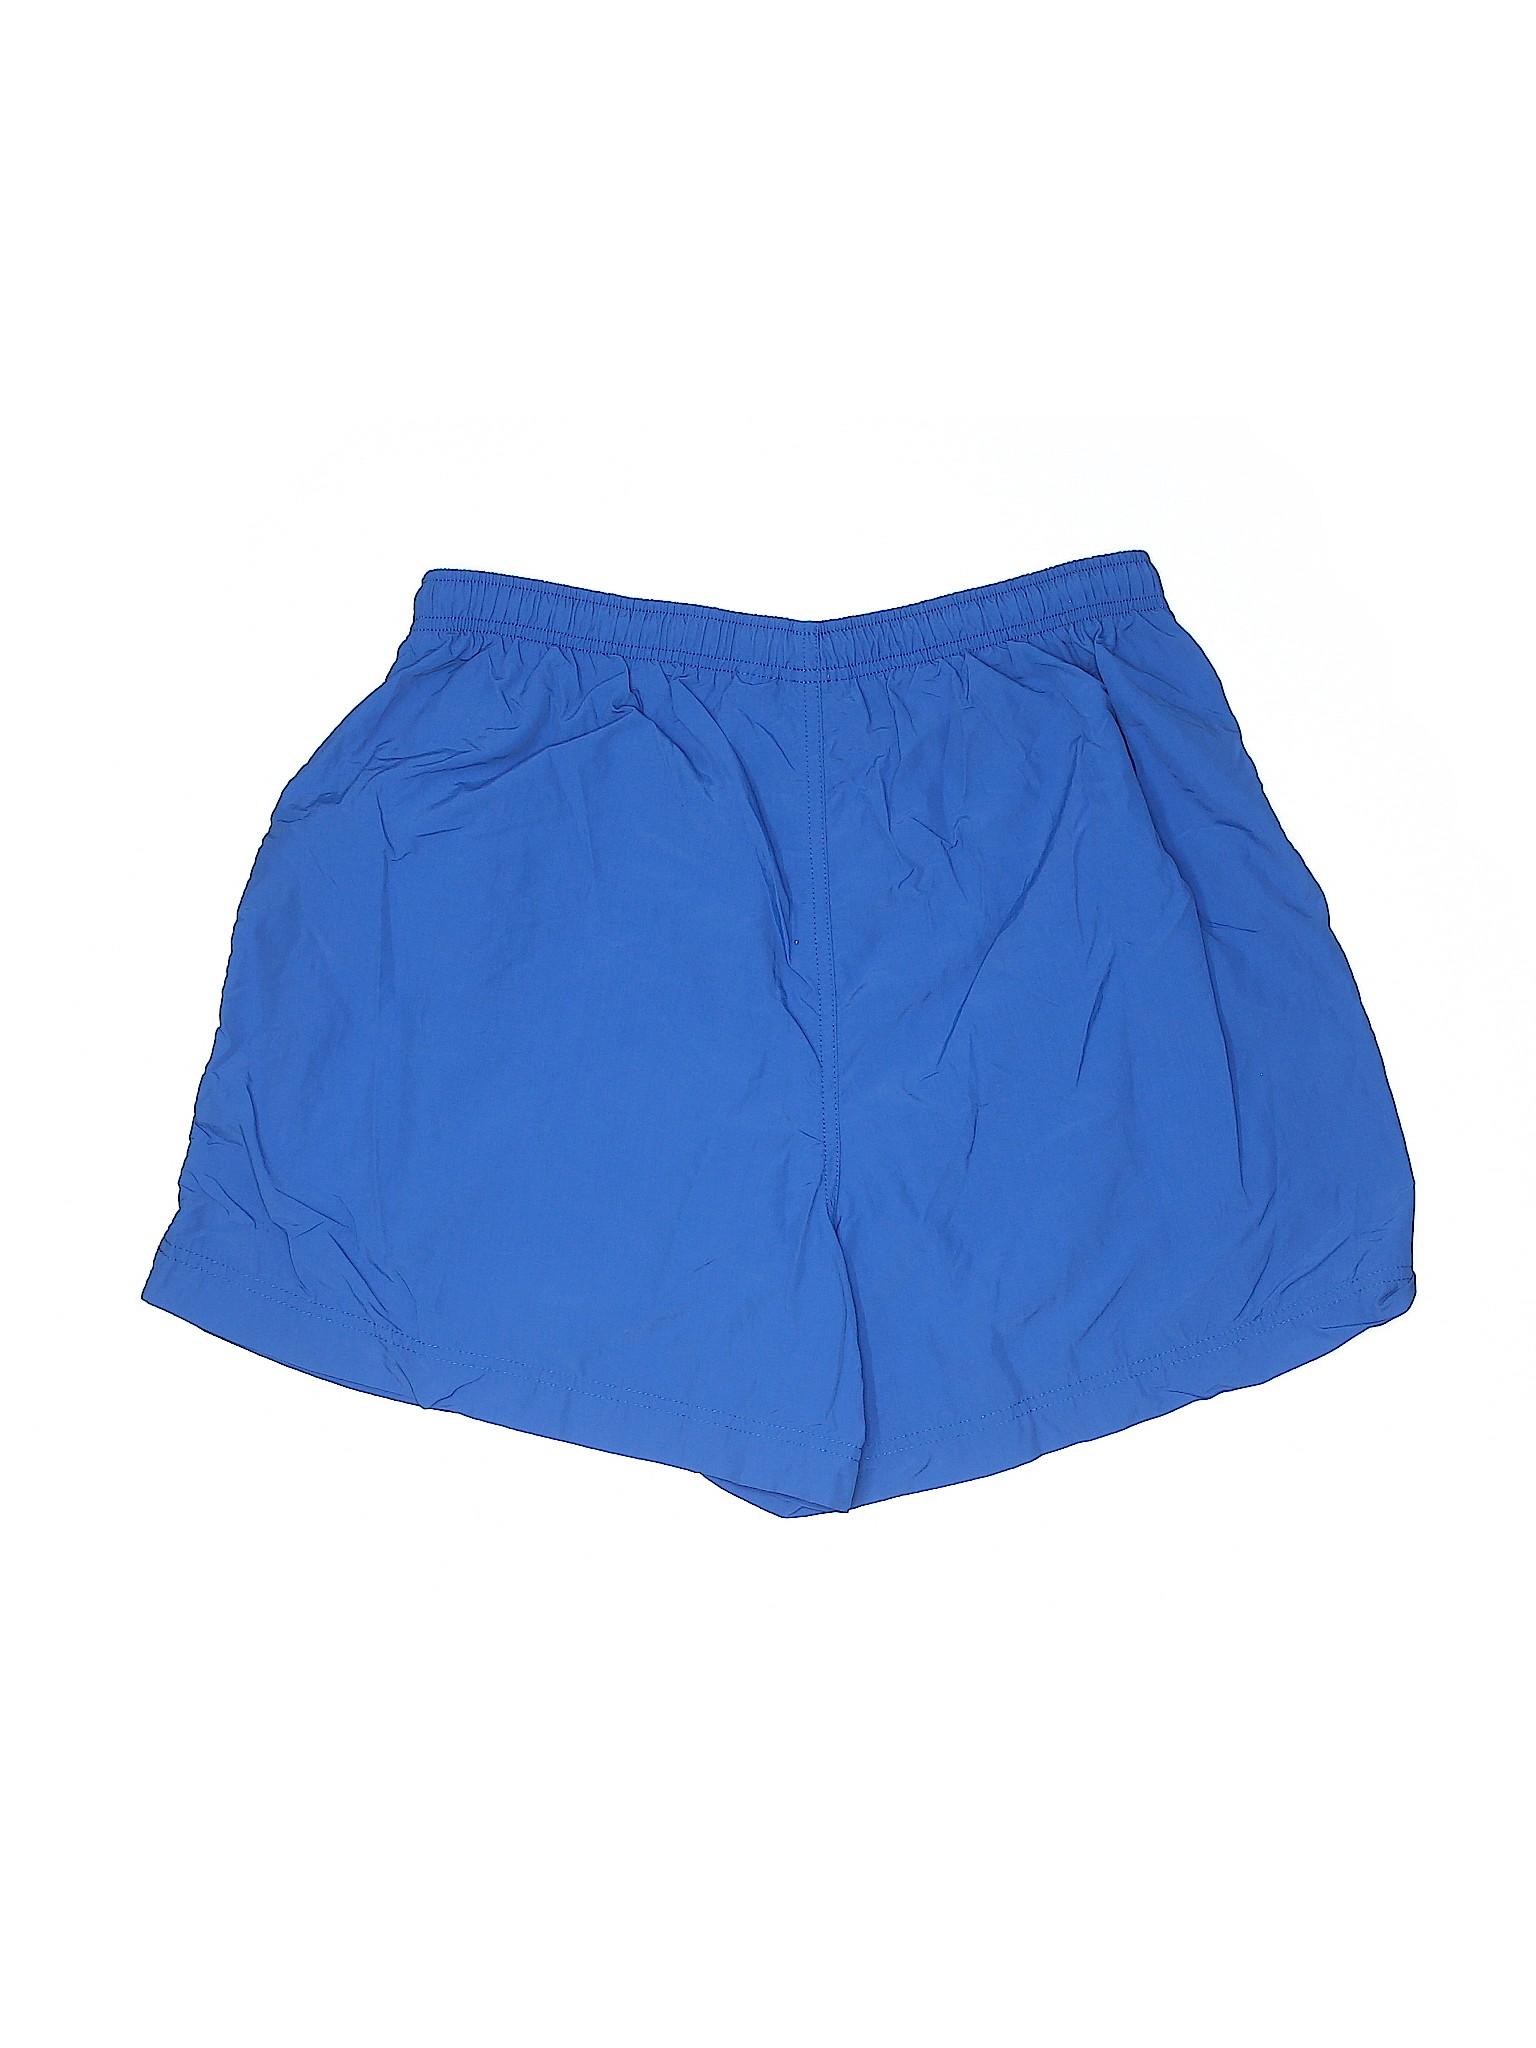 Shorts Leisure Athletic L L winter Bean Onn8fFxq